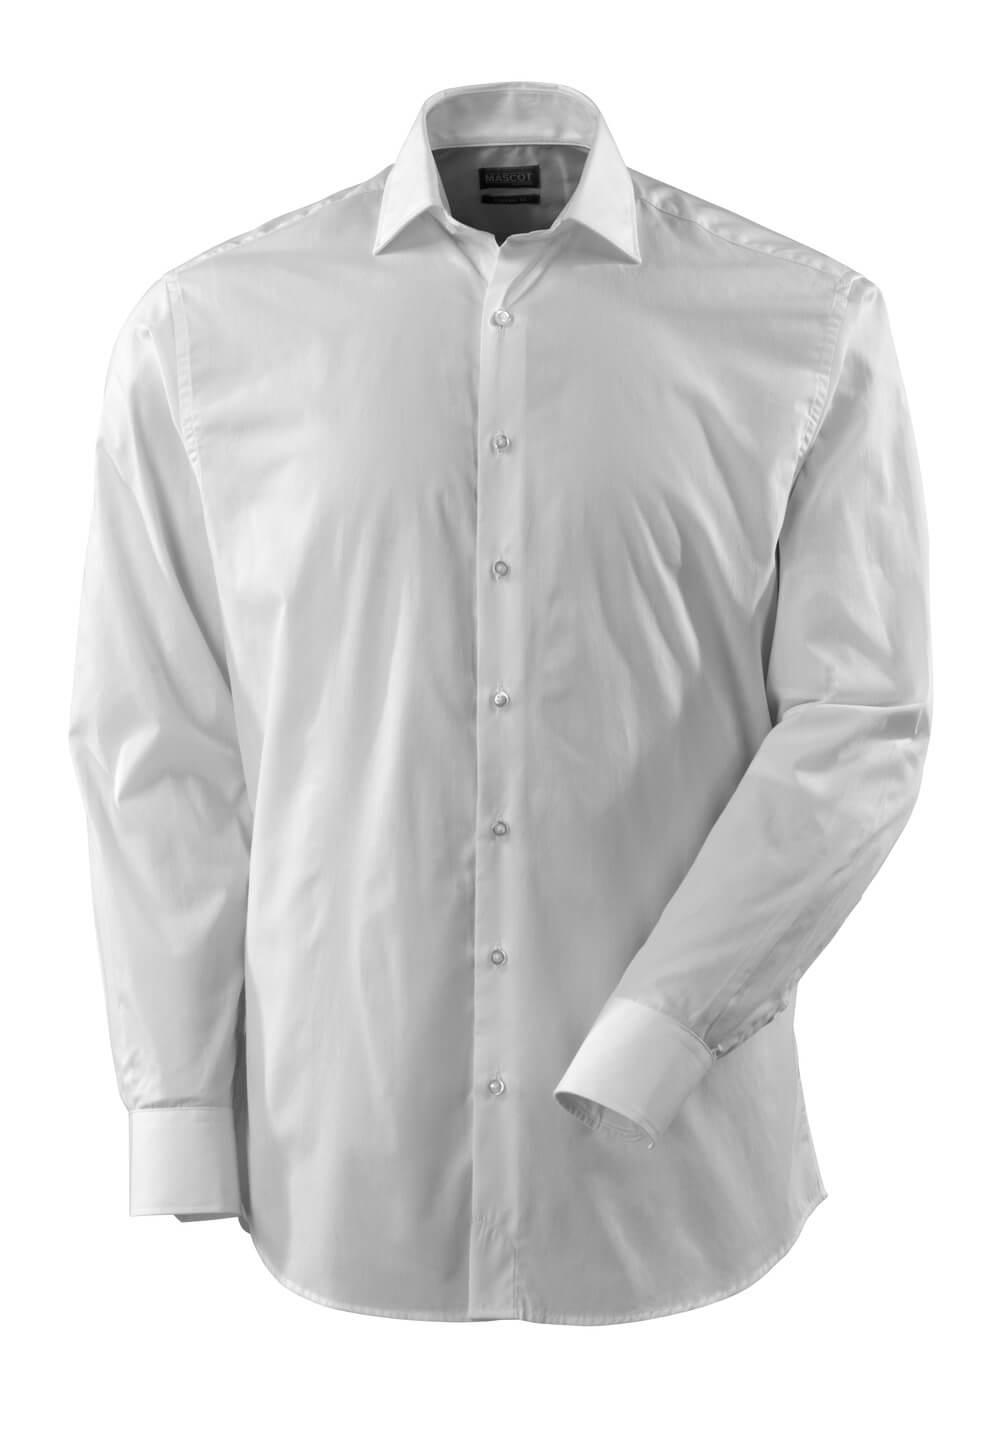 50631-984-06 Skjorte - hvid